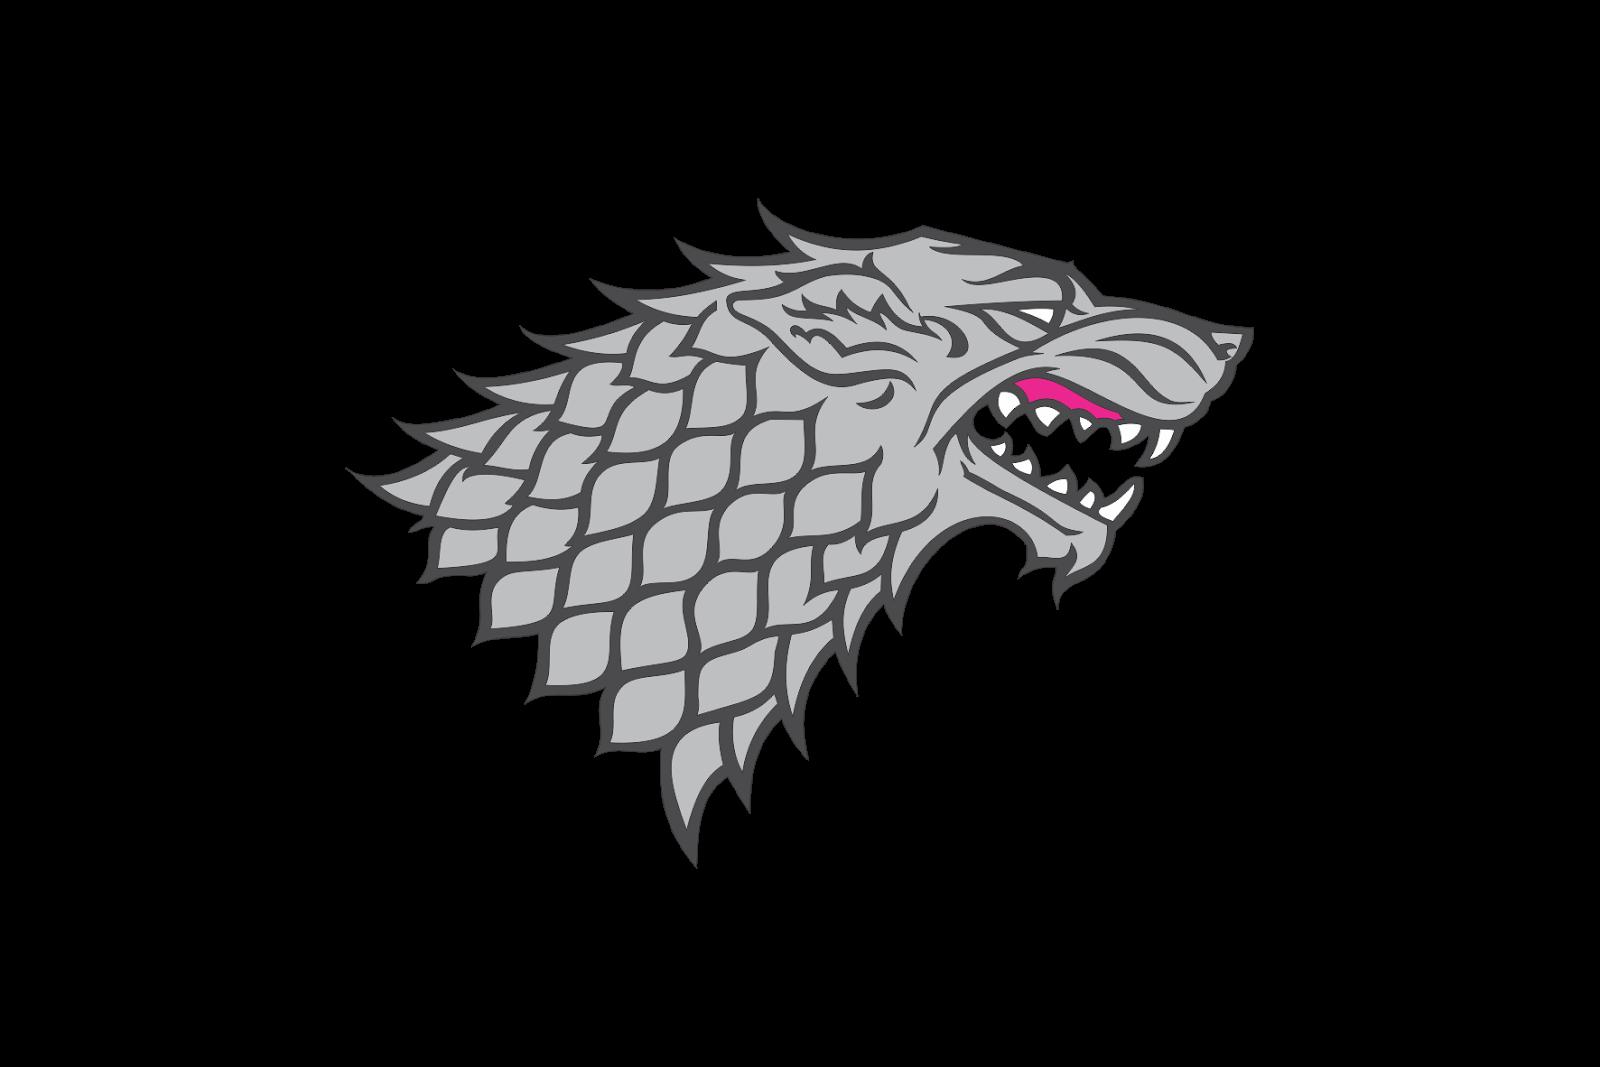 Eddard bran logo silver. House stark png